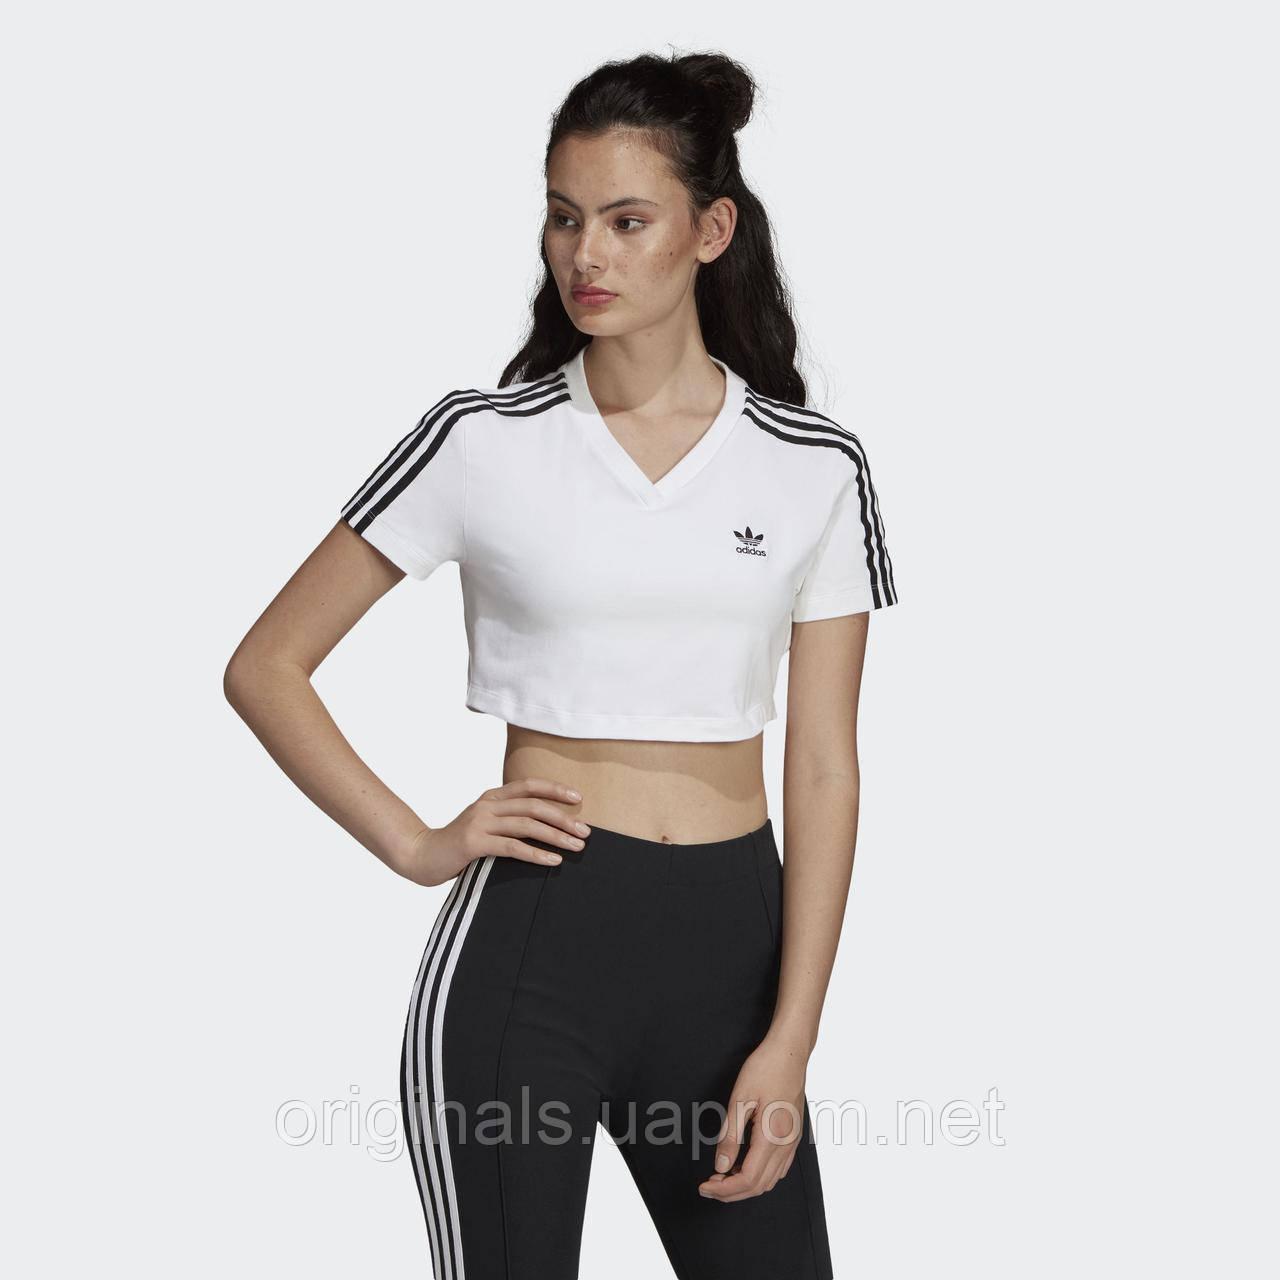 Женская футболка Adidas Cropped DV2620